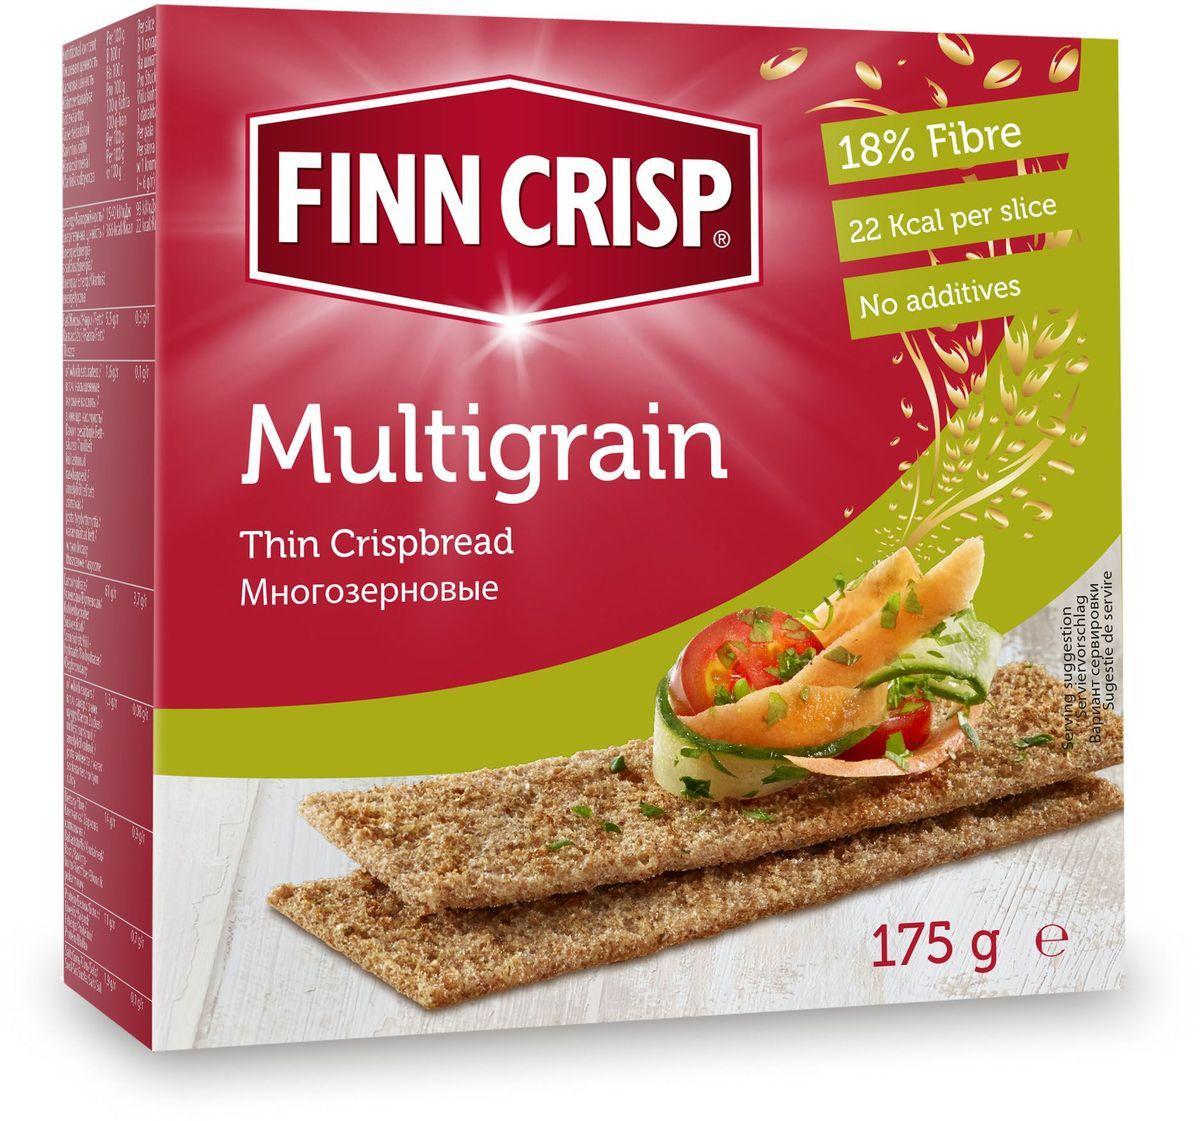 Finn Crisp Multigrain хлебцы многозерновые, 175 г